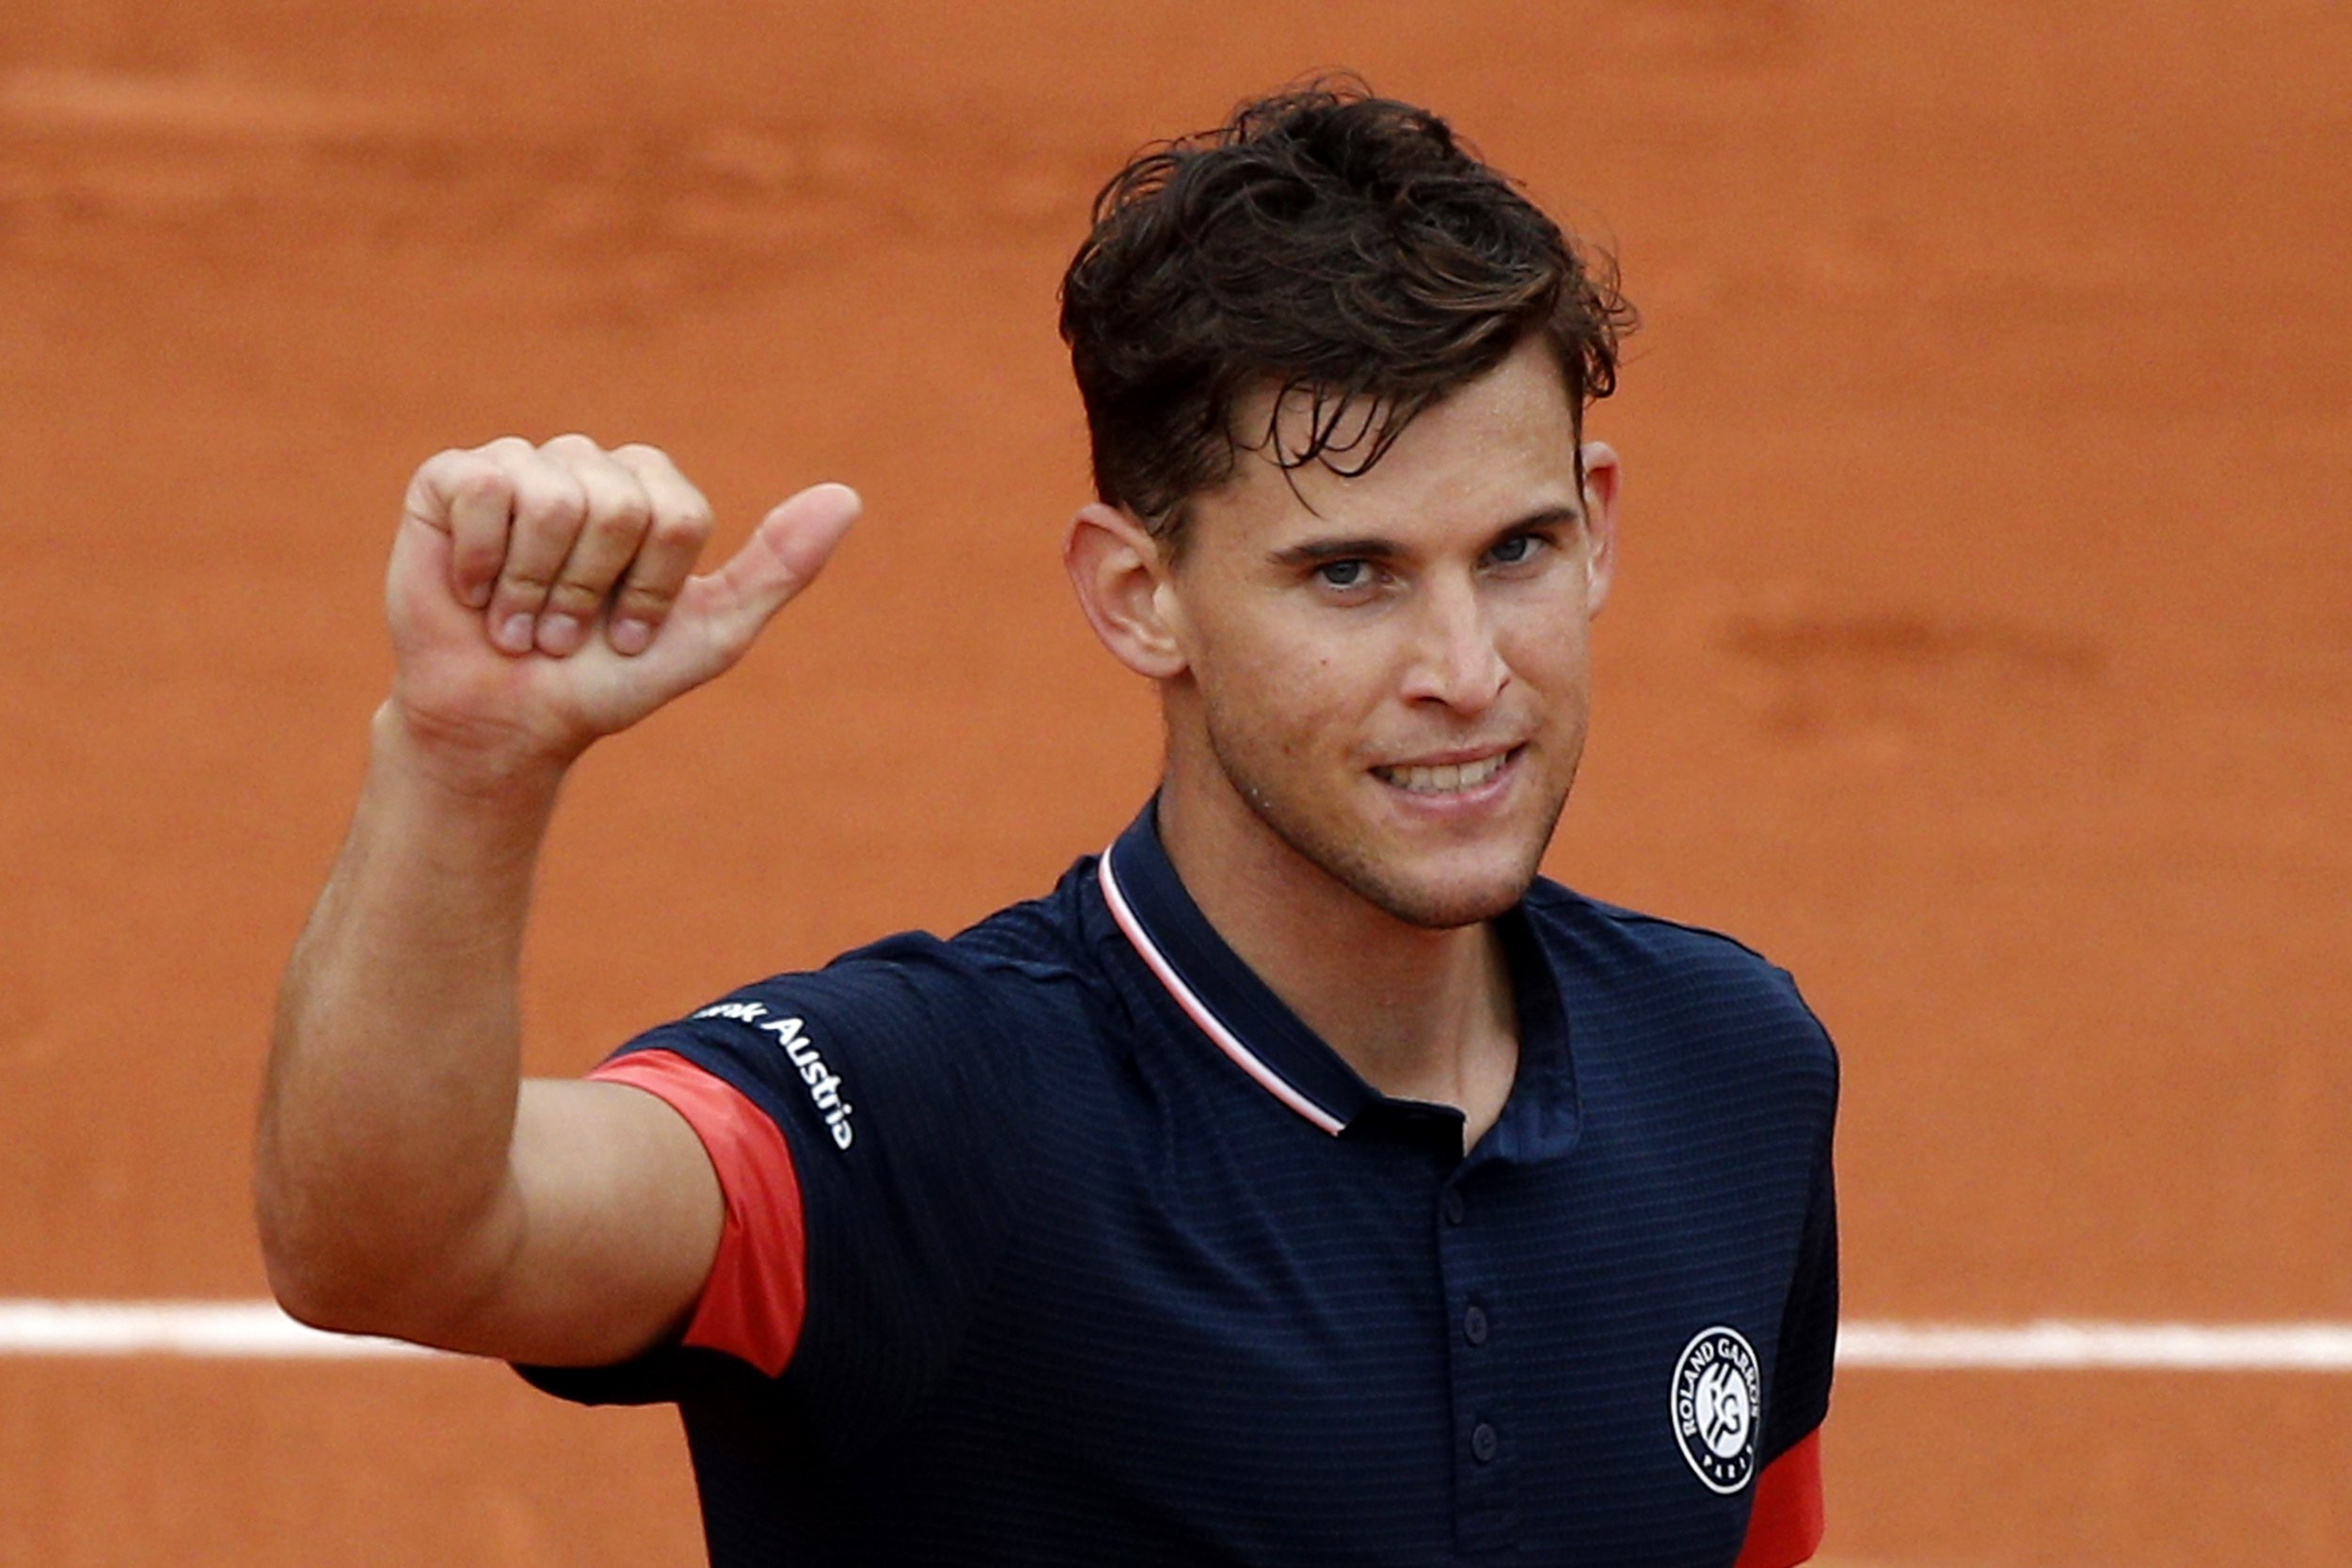 French Open Day 8 schedule: Order of play with Djokovic, Wozniacki and Nishikori v Thiem